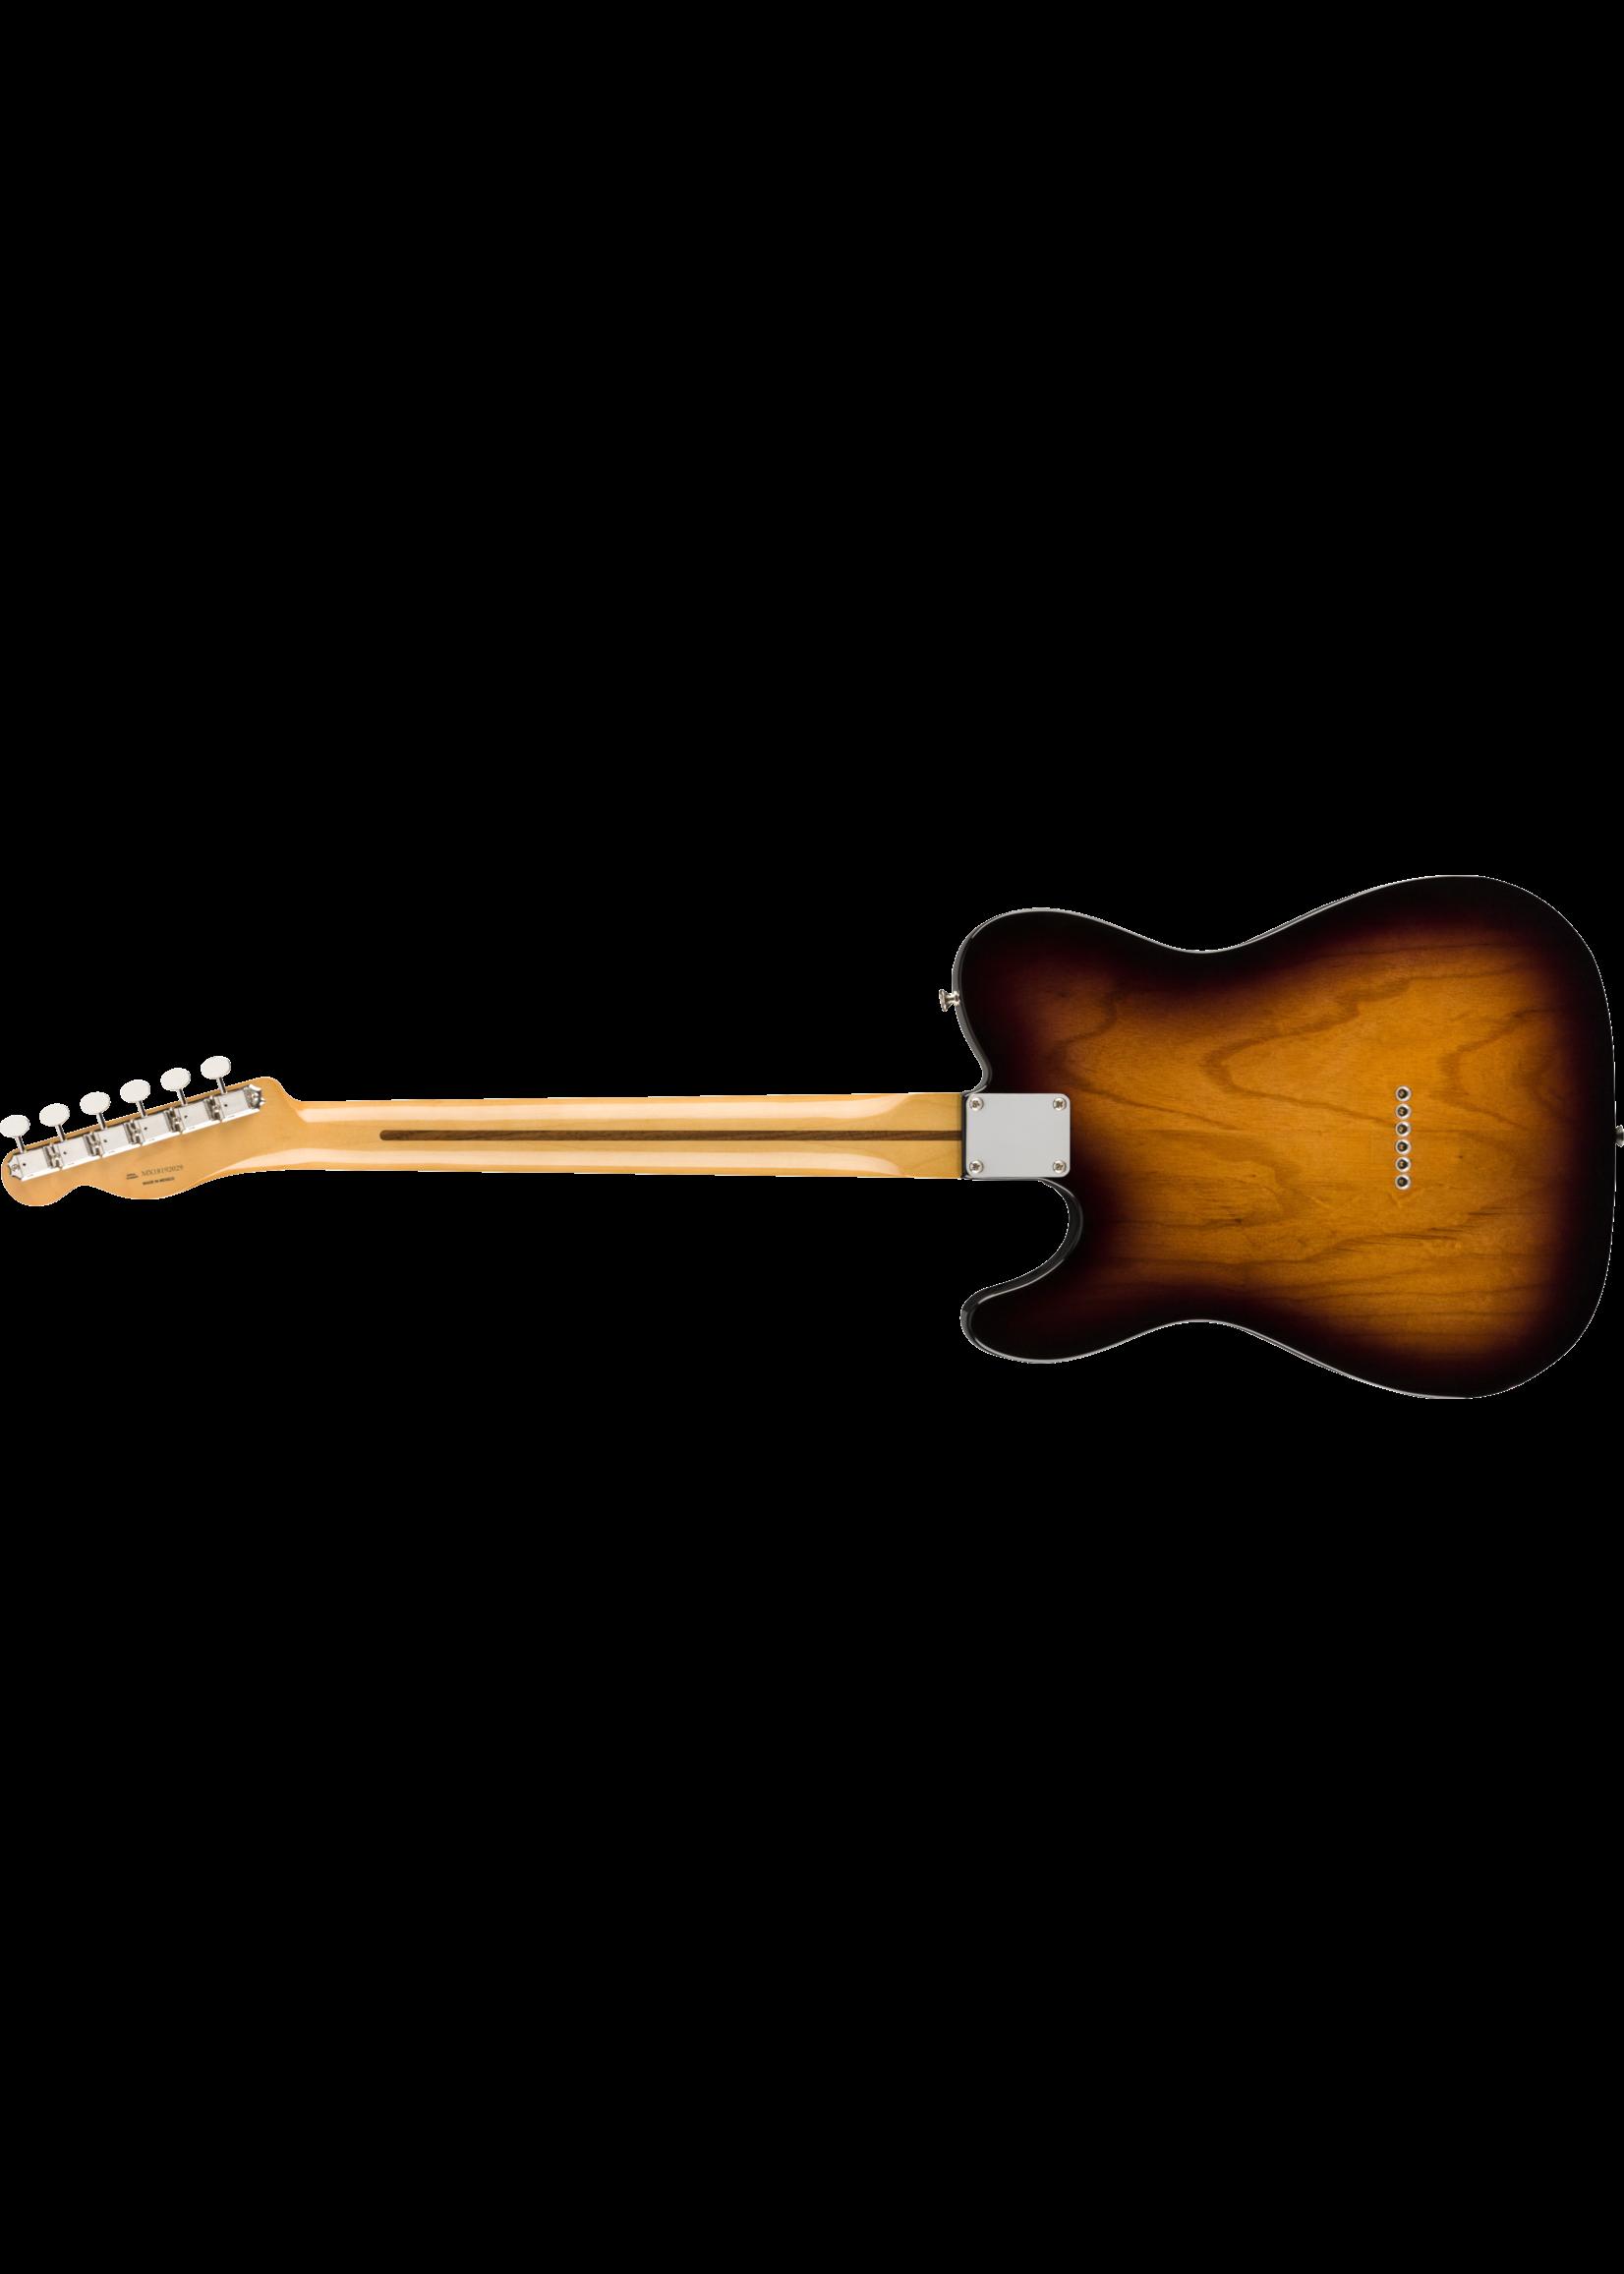 Fender Fender Vintera '50s Telecaster with Maple Fretboard 2-Color Sunburst